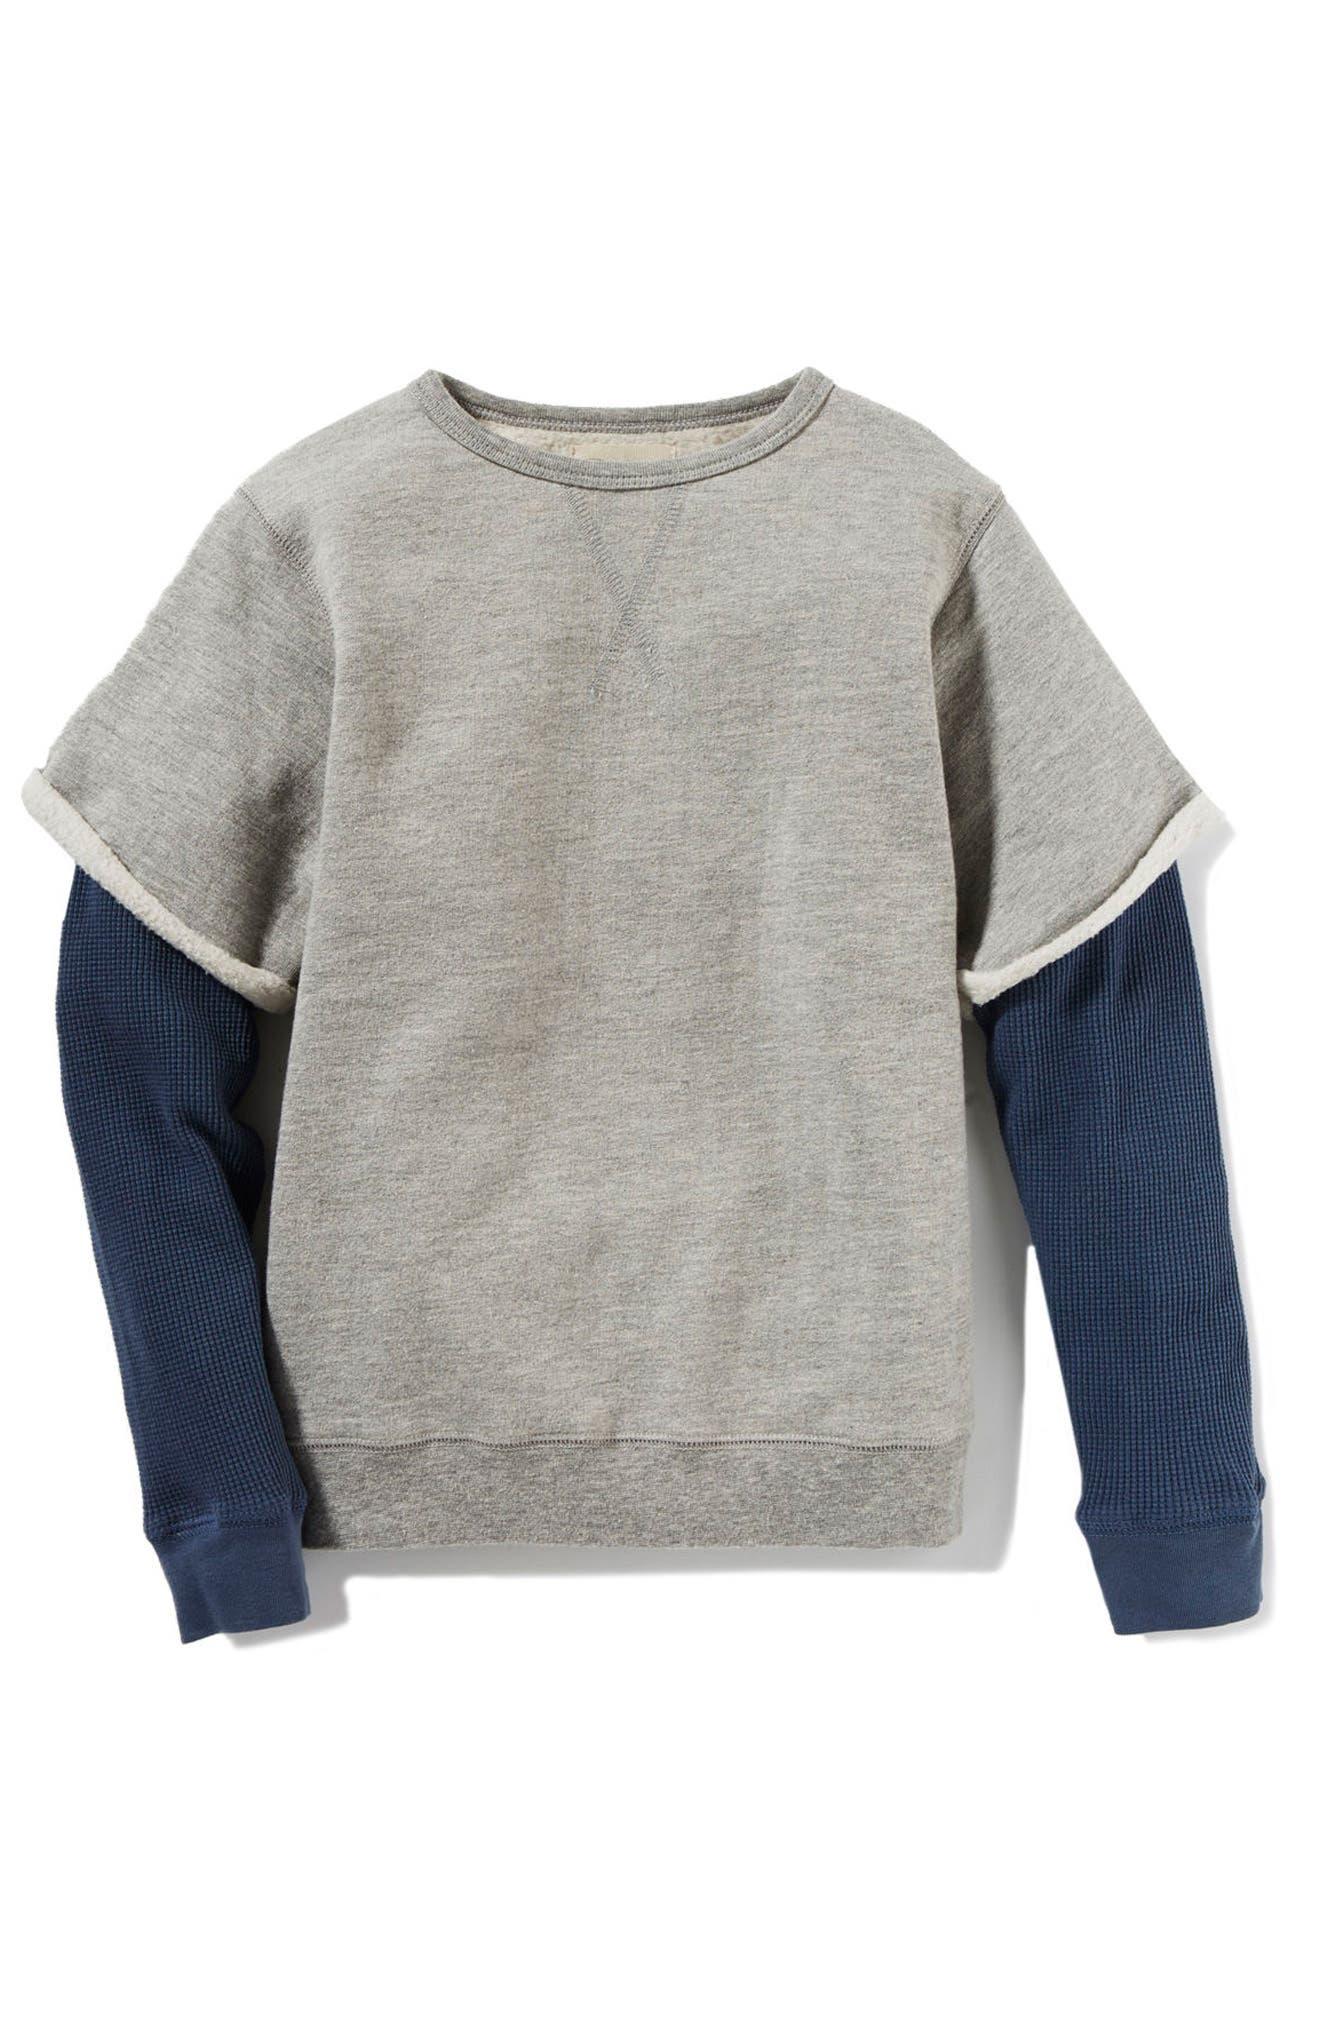 Axel Layer Sweatshirt,                         Main,                         color, Heather Grey